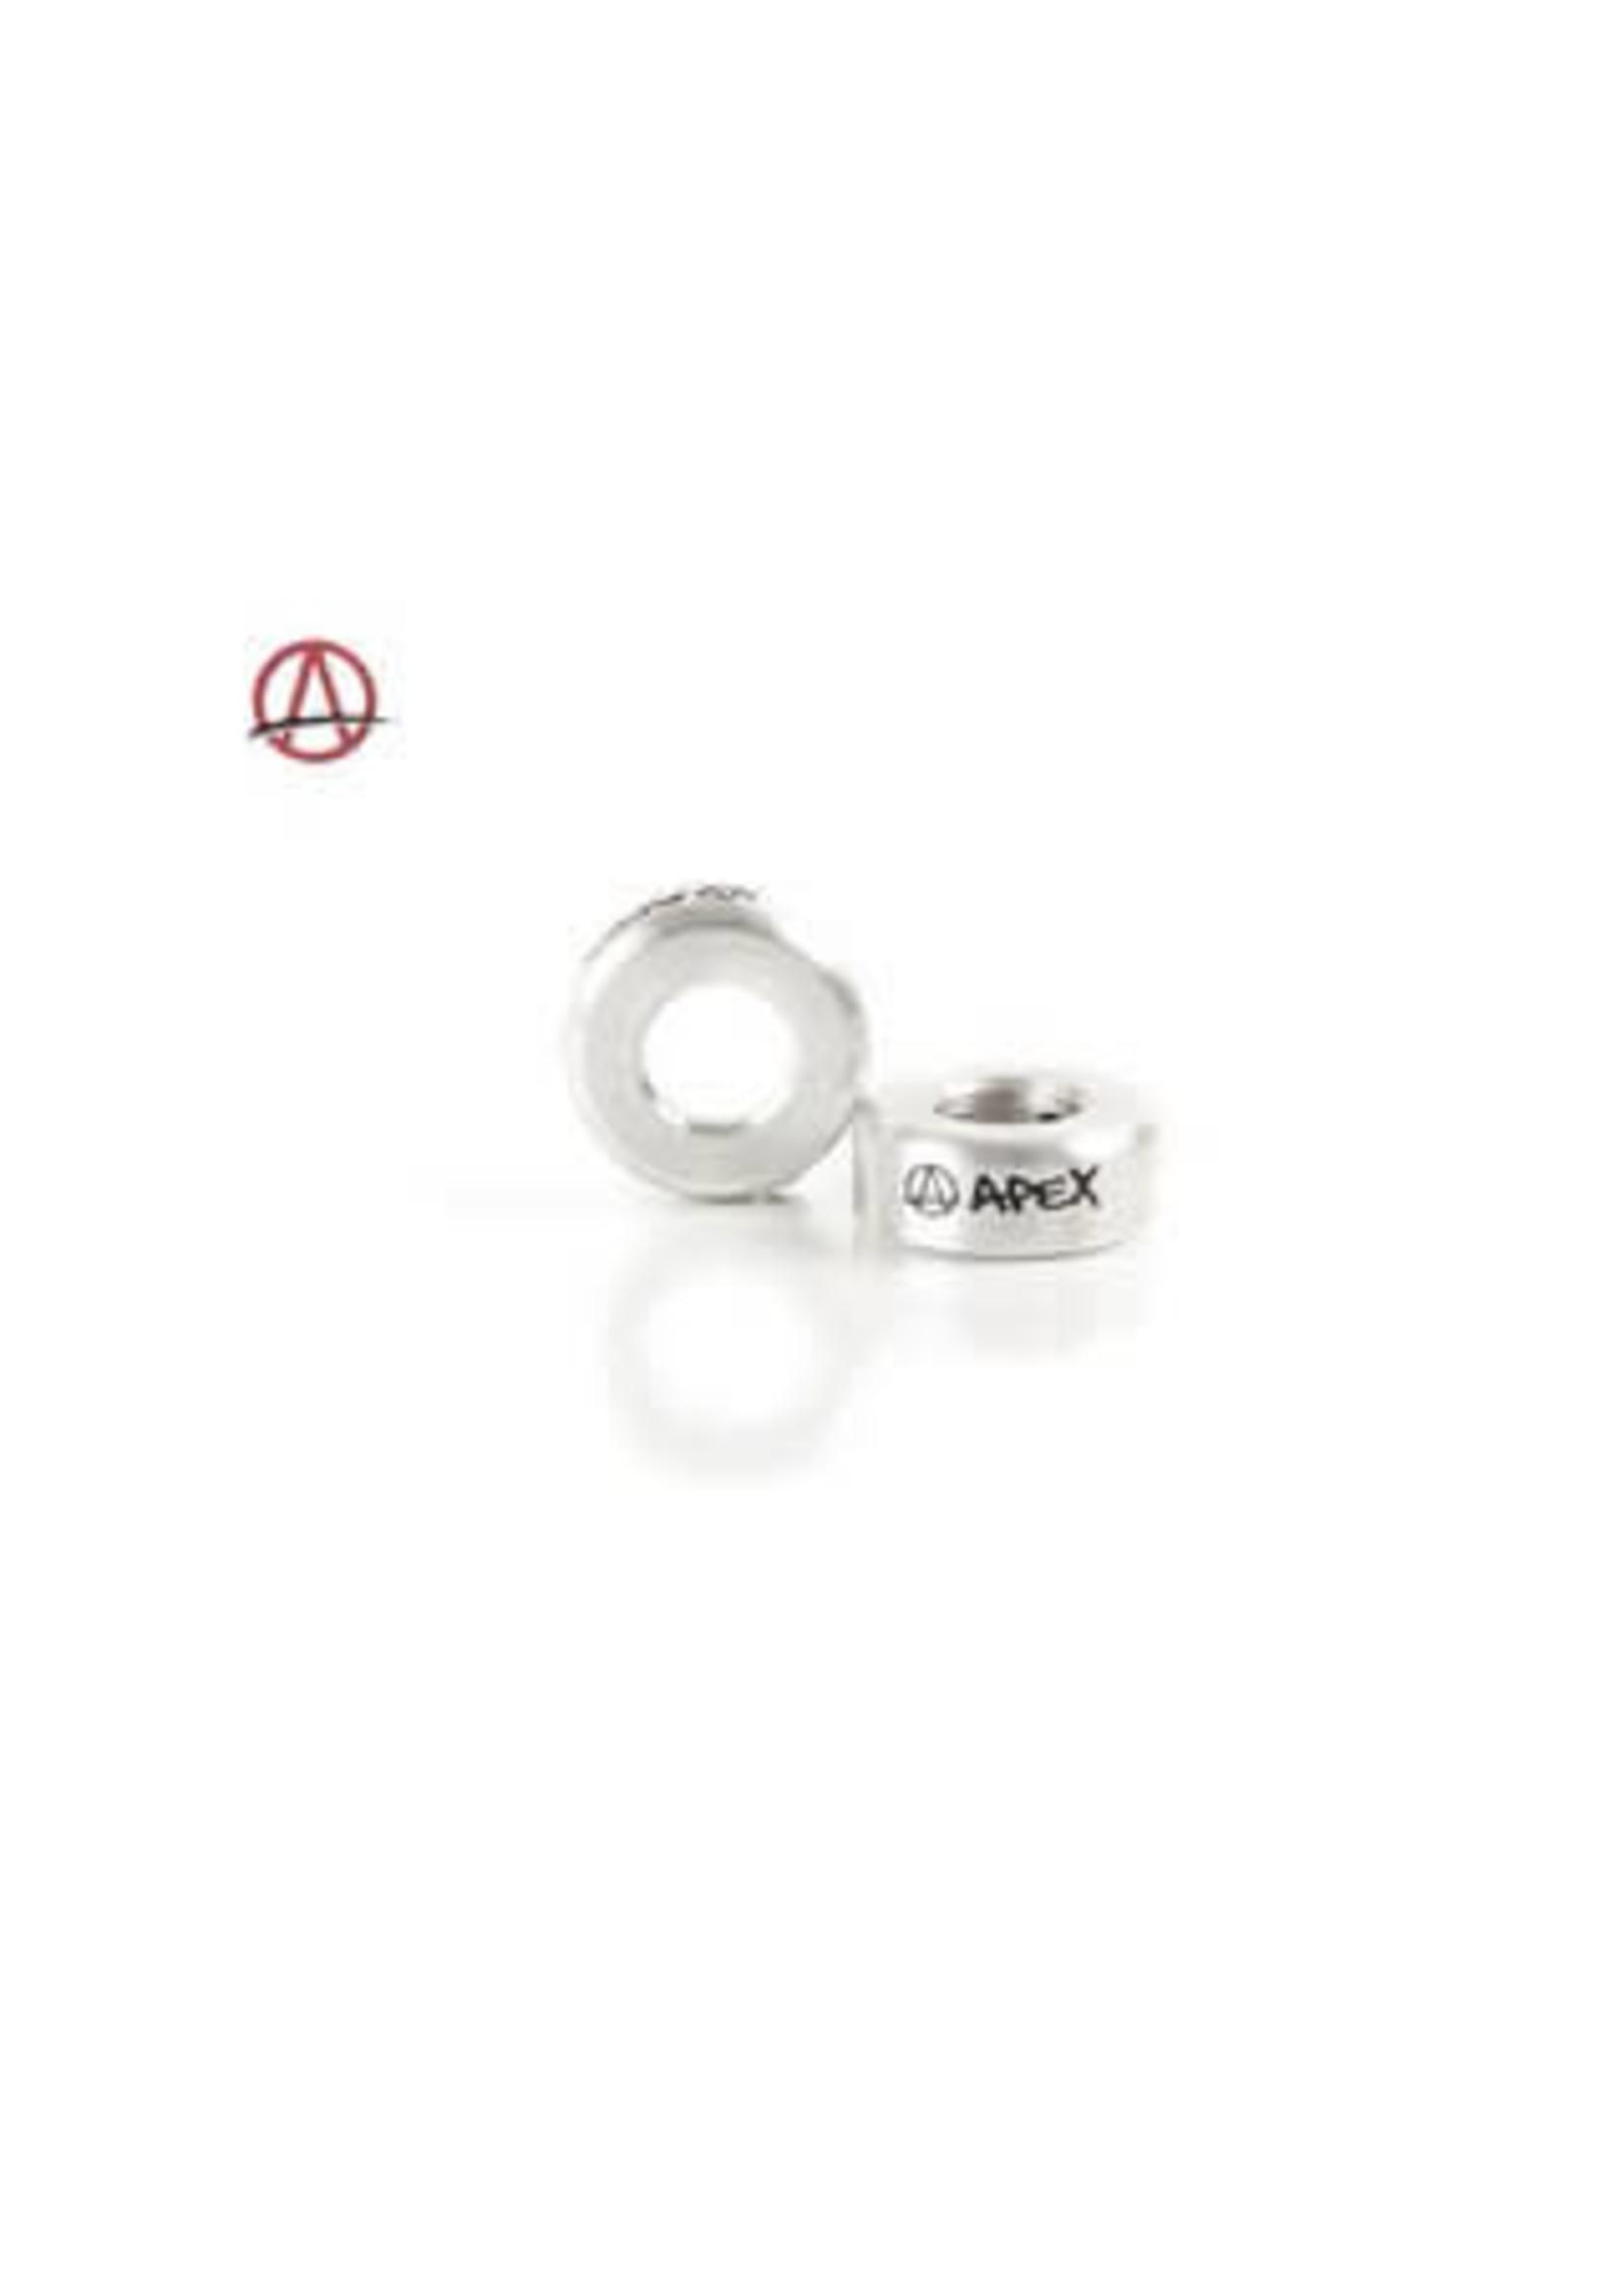 Apex Apex - Aluminum Bar Ends